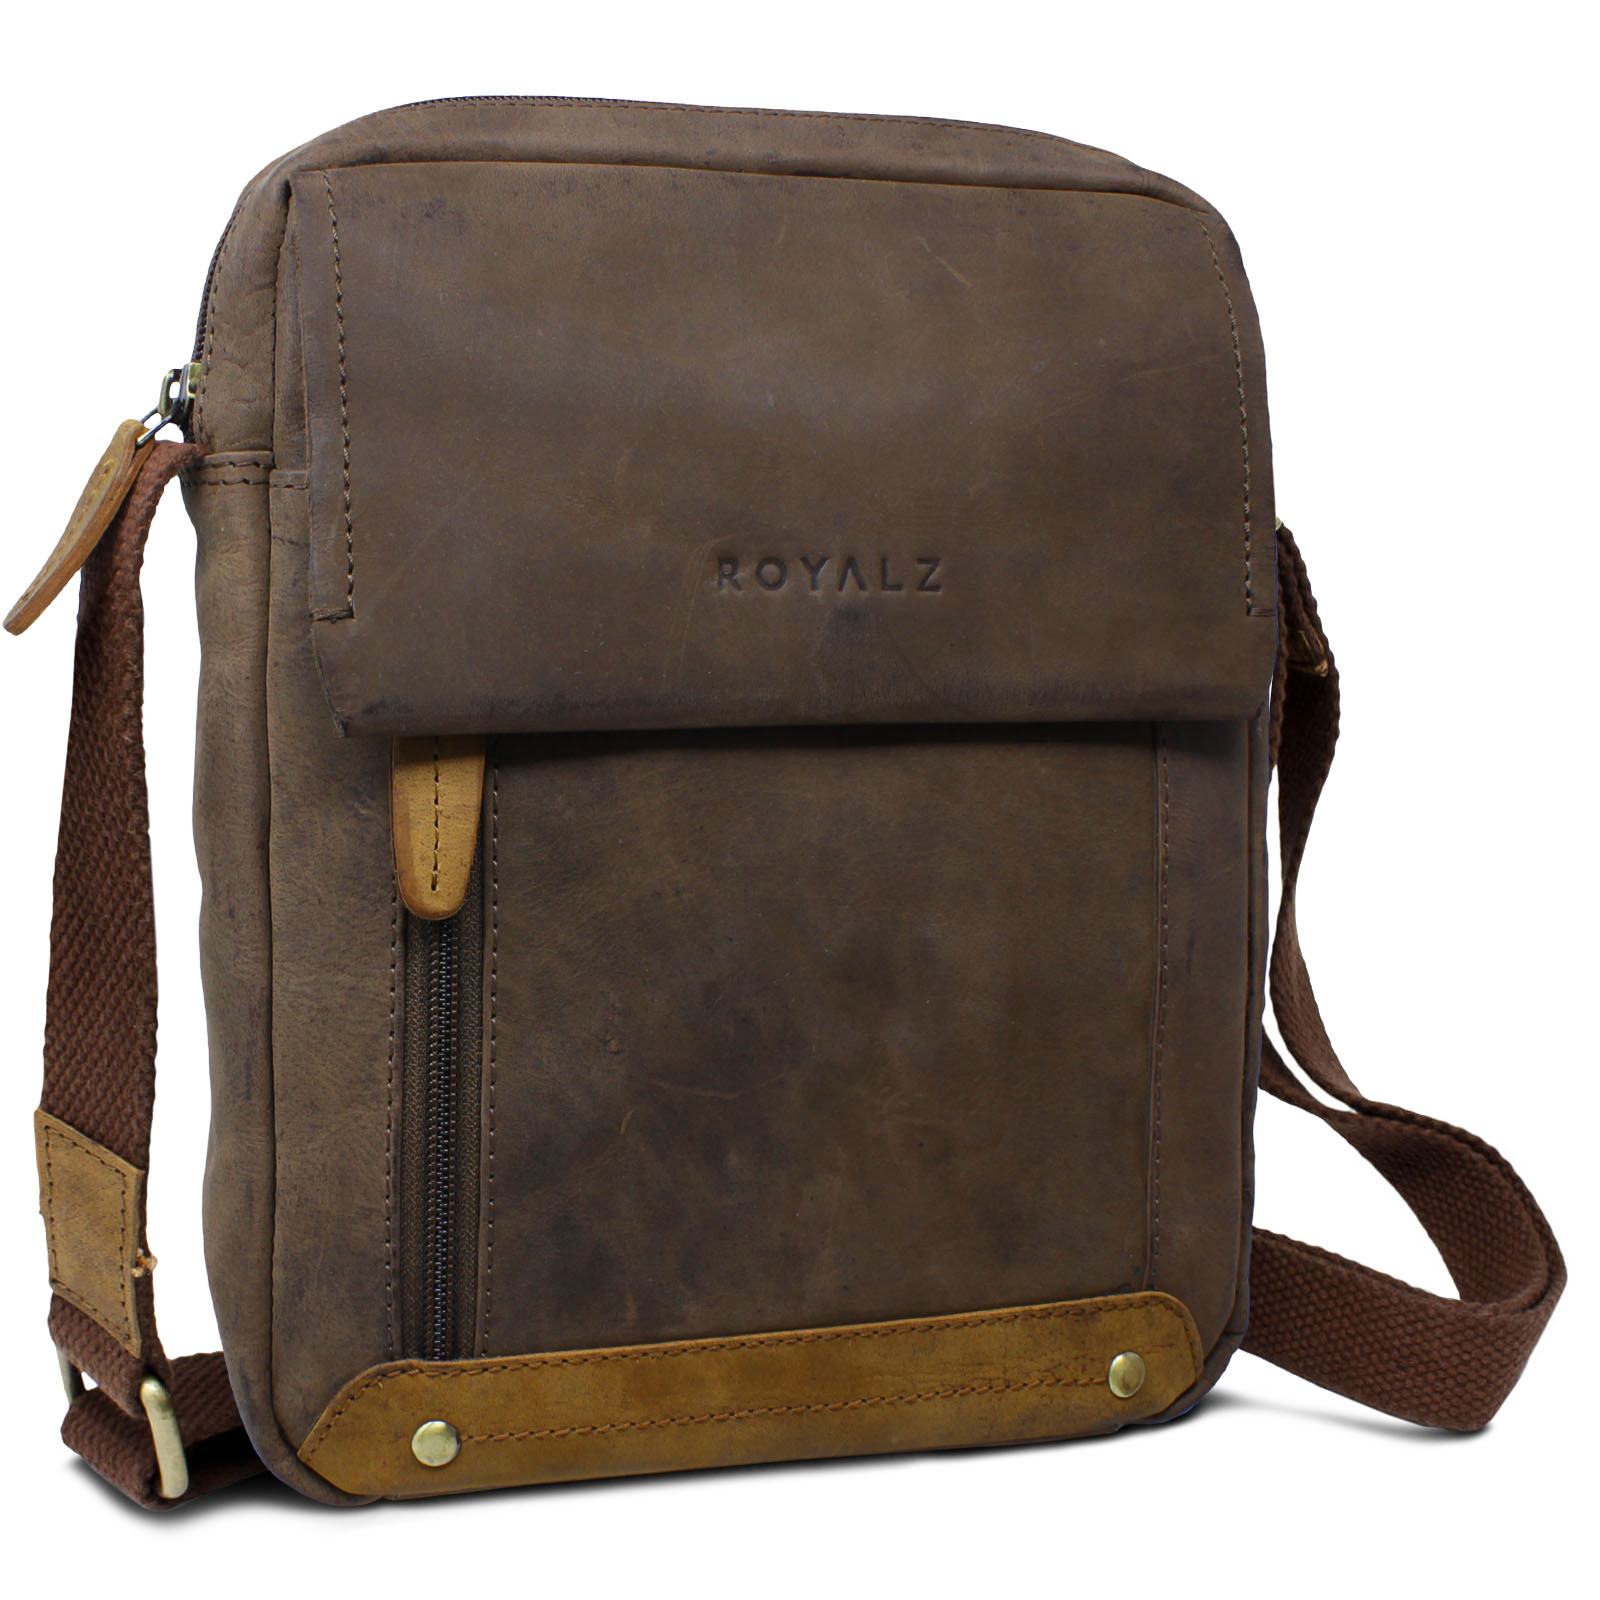 8ad8903da1ff0 ROYALZ Leder Umhängetasche für Herren klein kompakte Design Ledertasche  Messenger Bag Vintage-Look